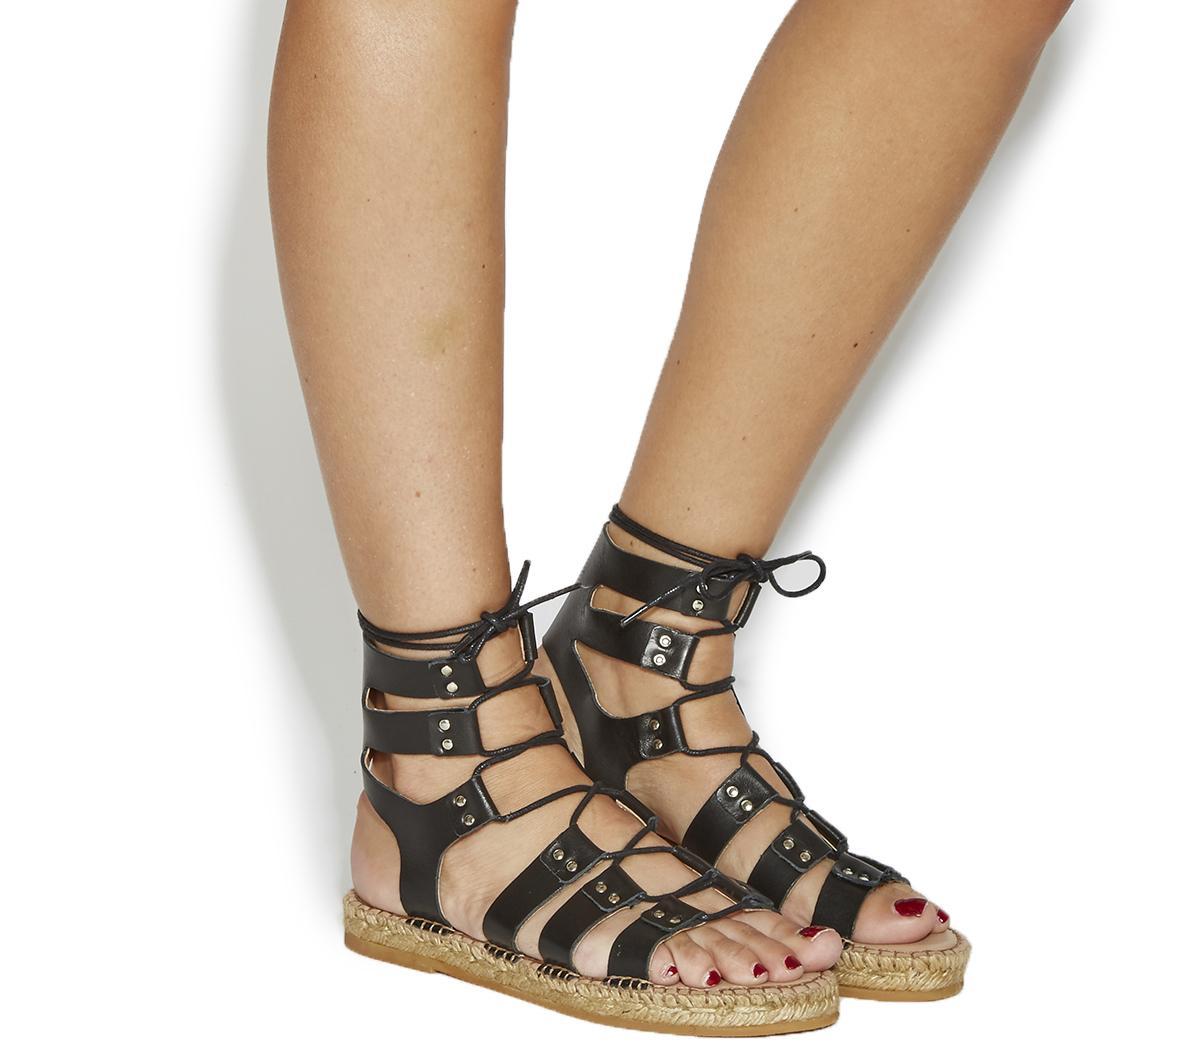 Jacobo Sandals